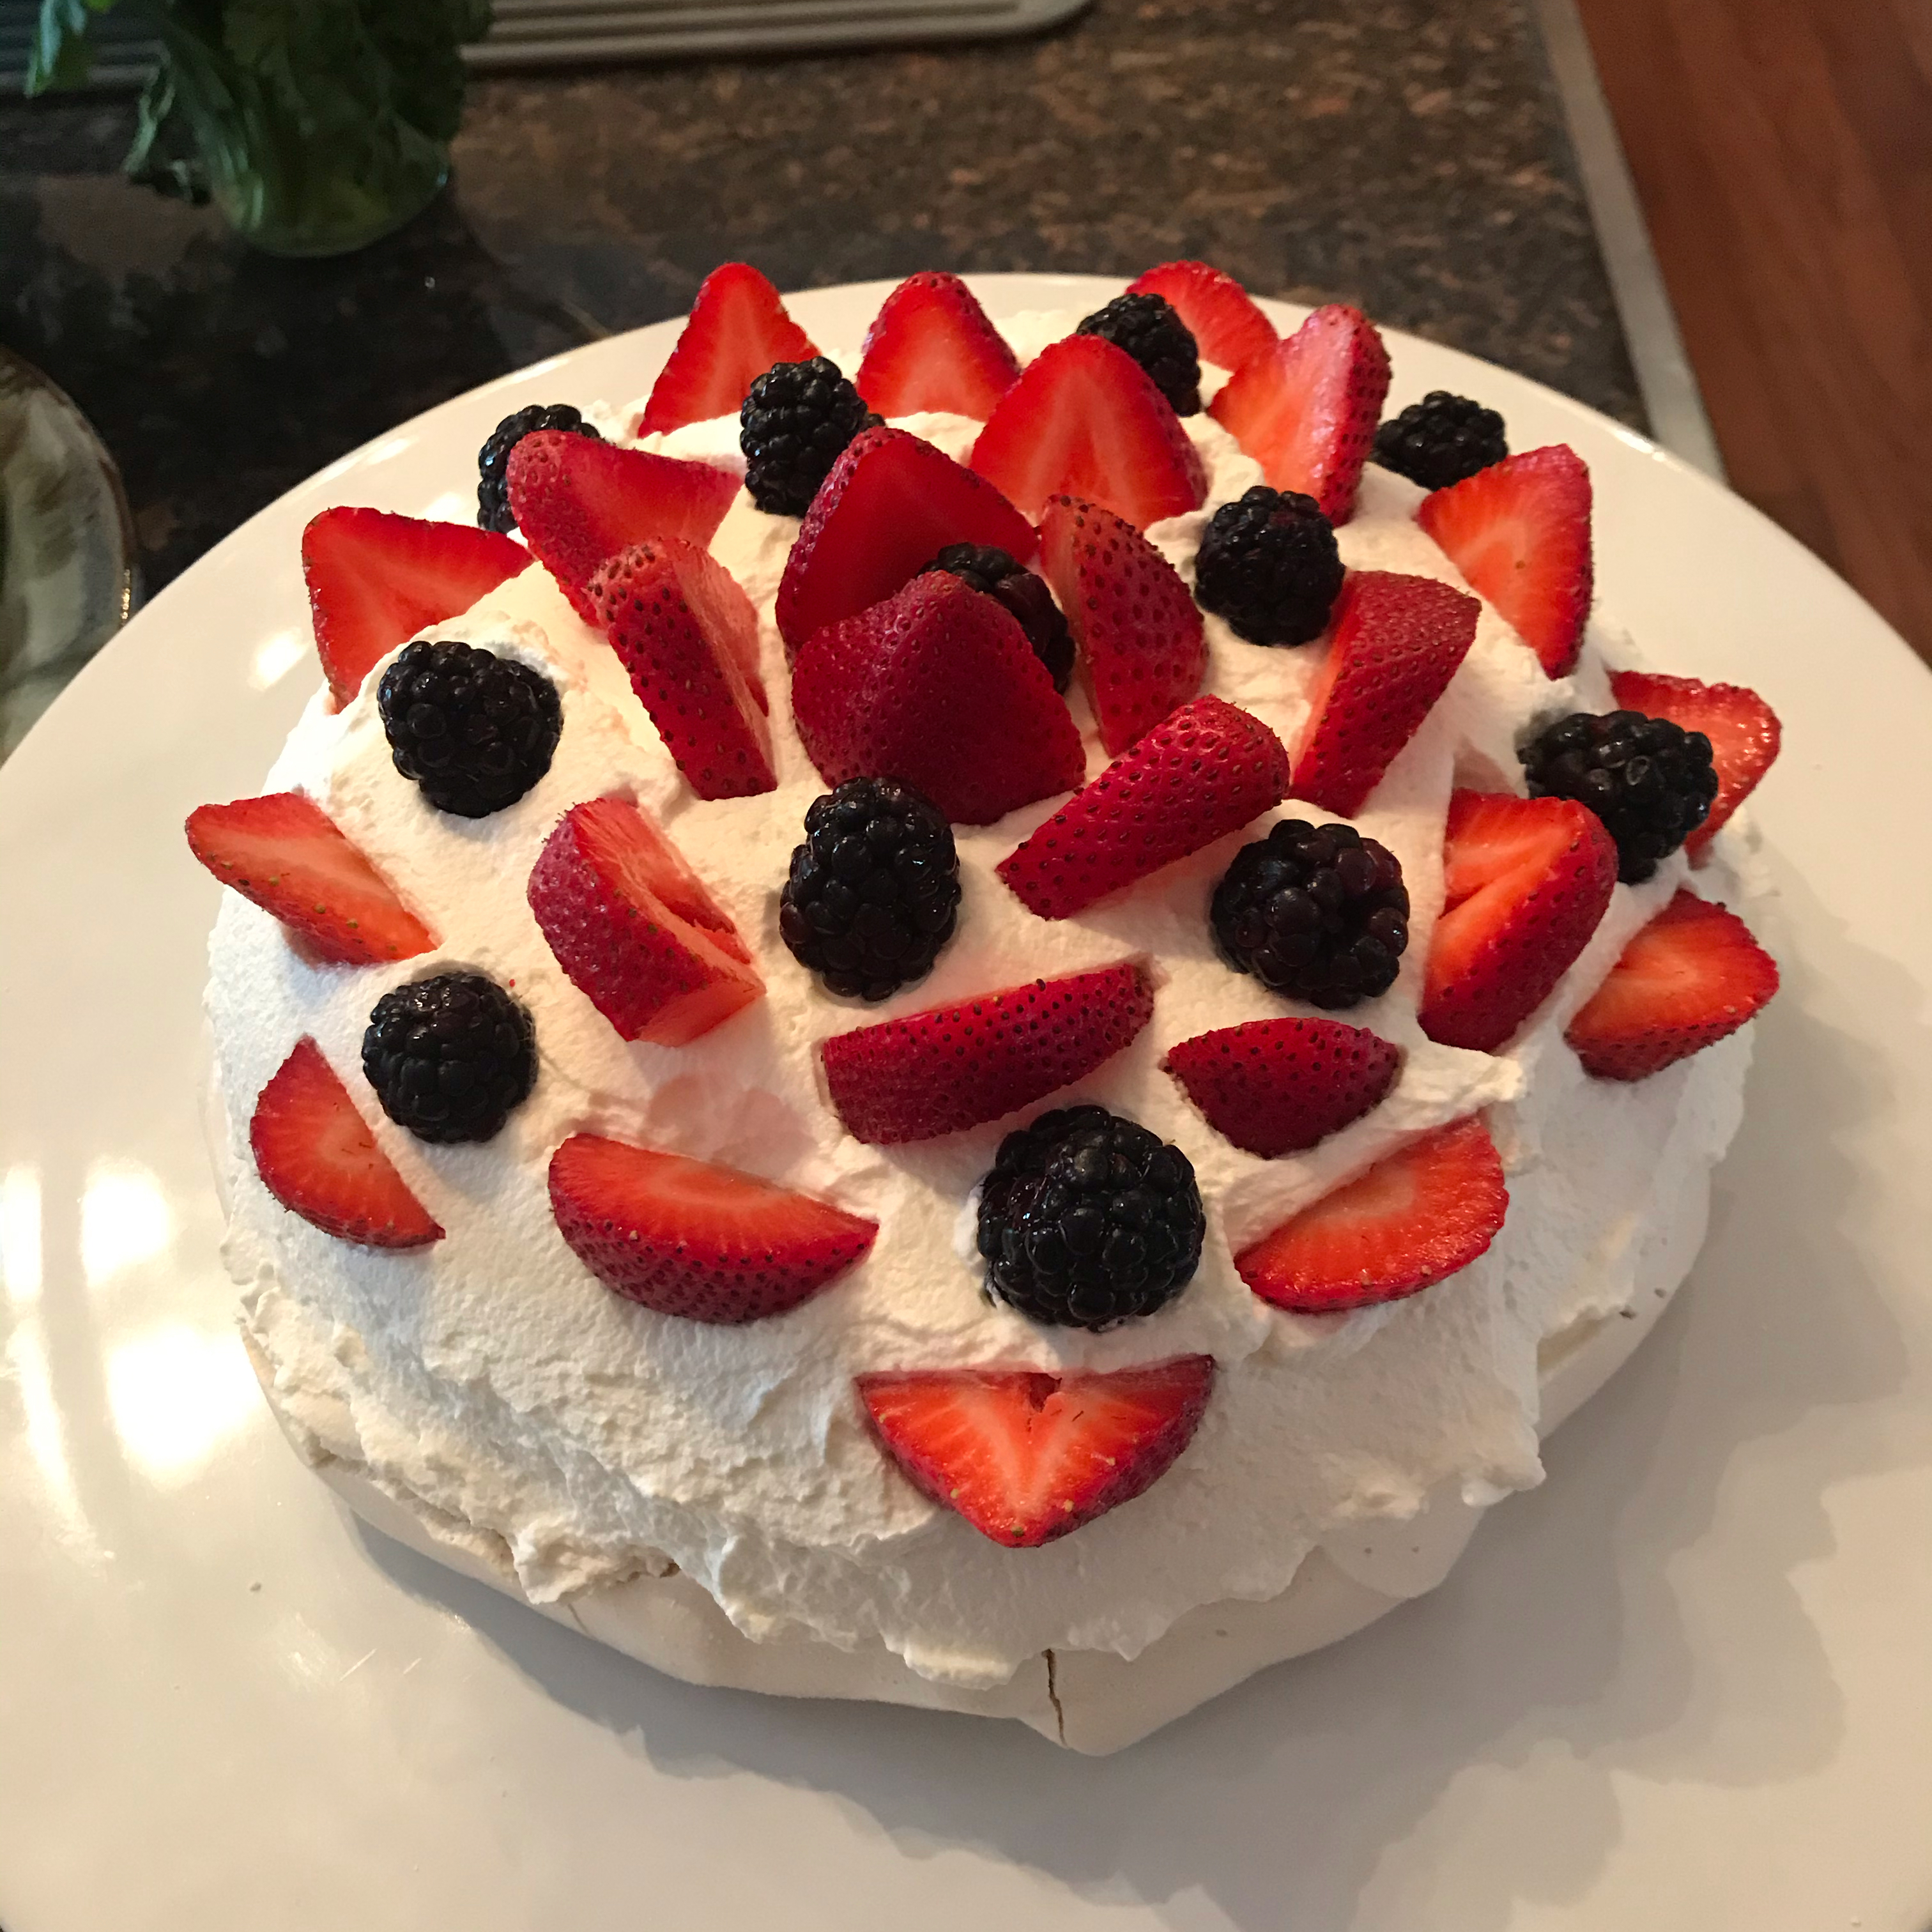 Chef John's Pavlova with Strawberries